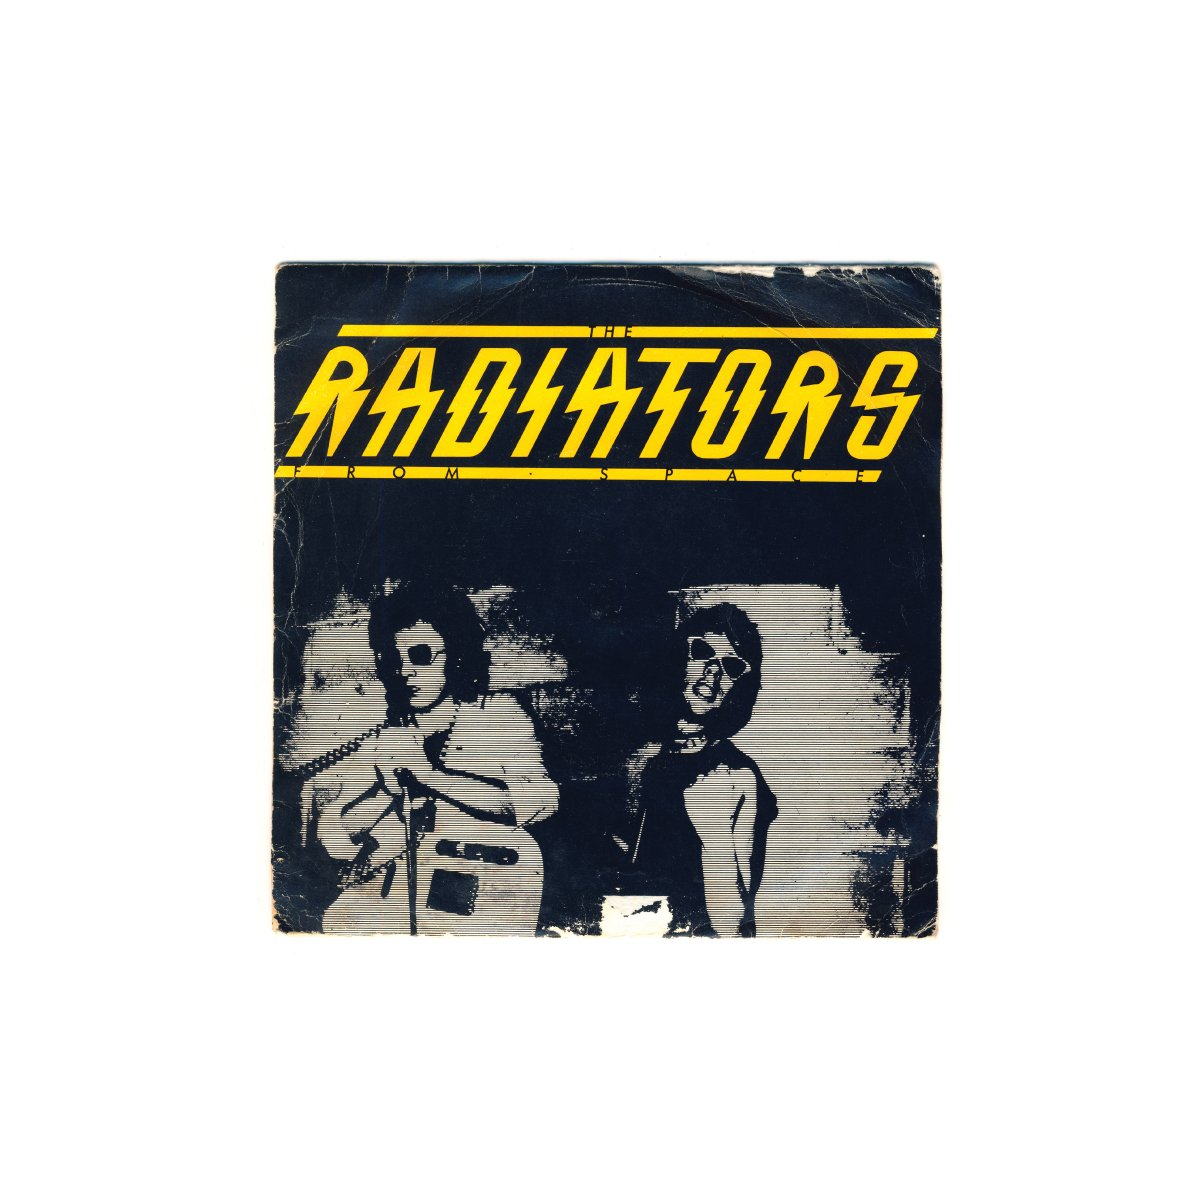 "Television Screen; The Radiators; Chiswick (1977); design / photography: Art On My Sleeve (Steve Averill); print: Press & Post Ltd (UK); 7"""